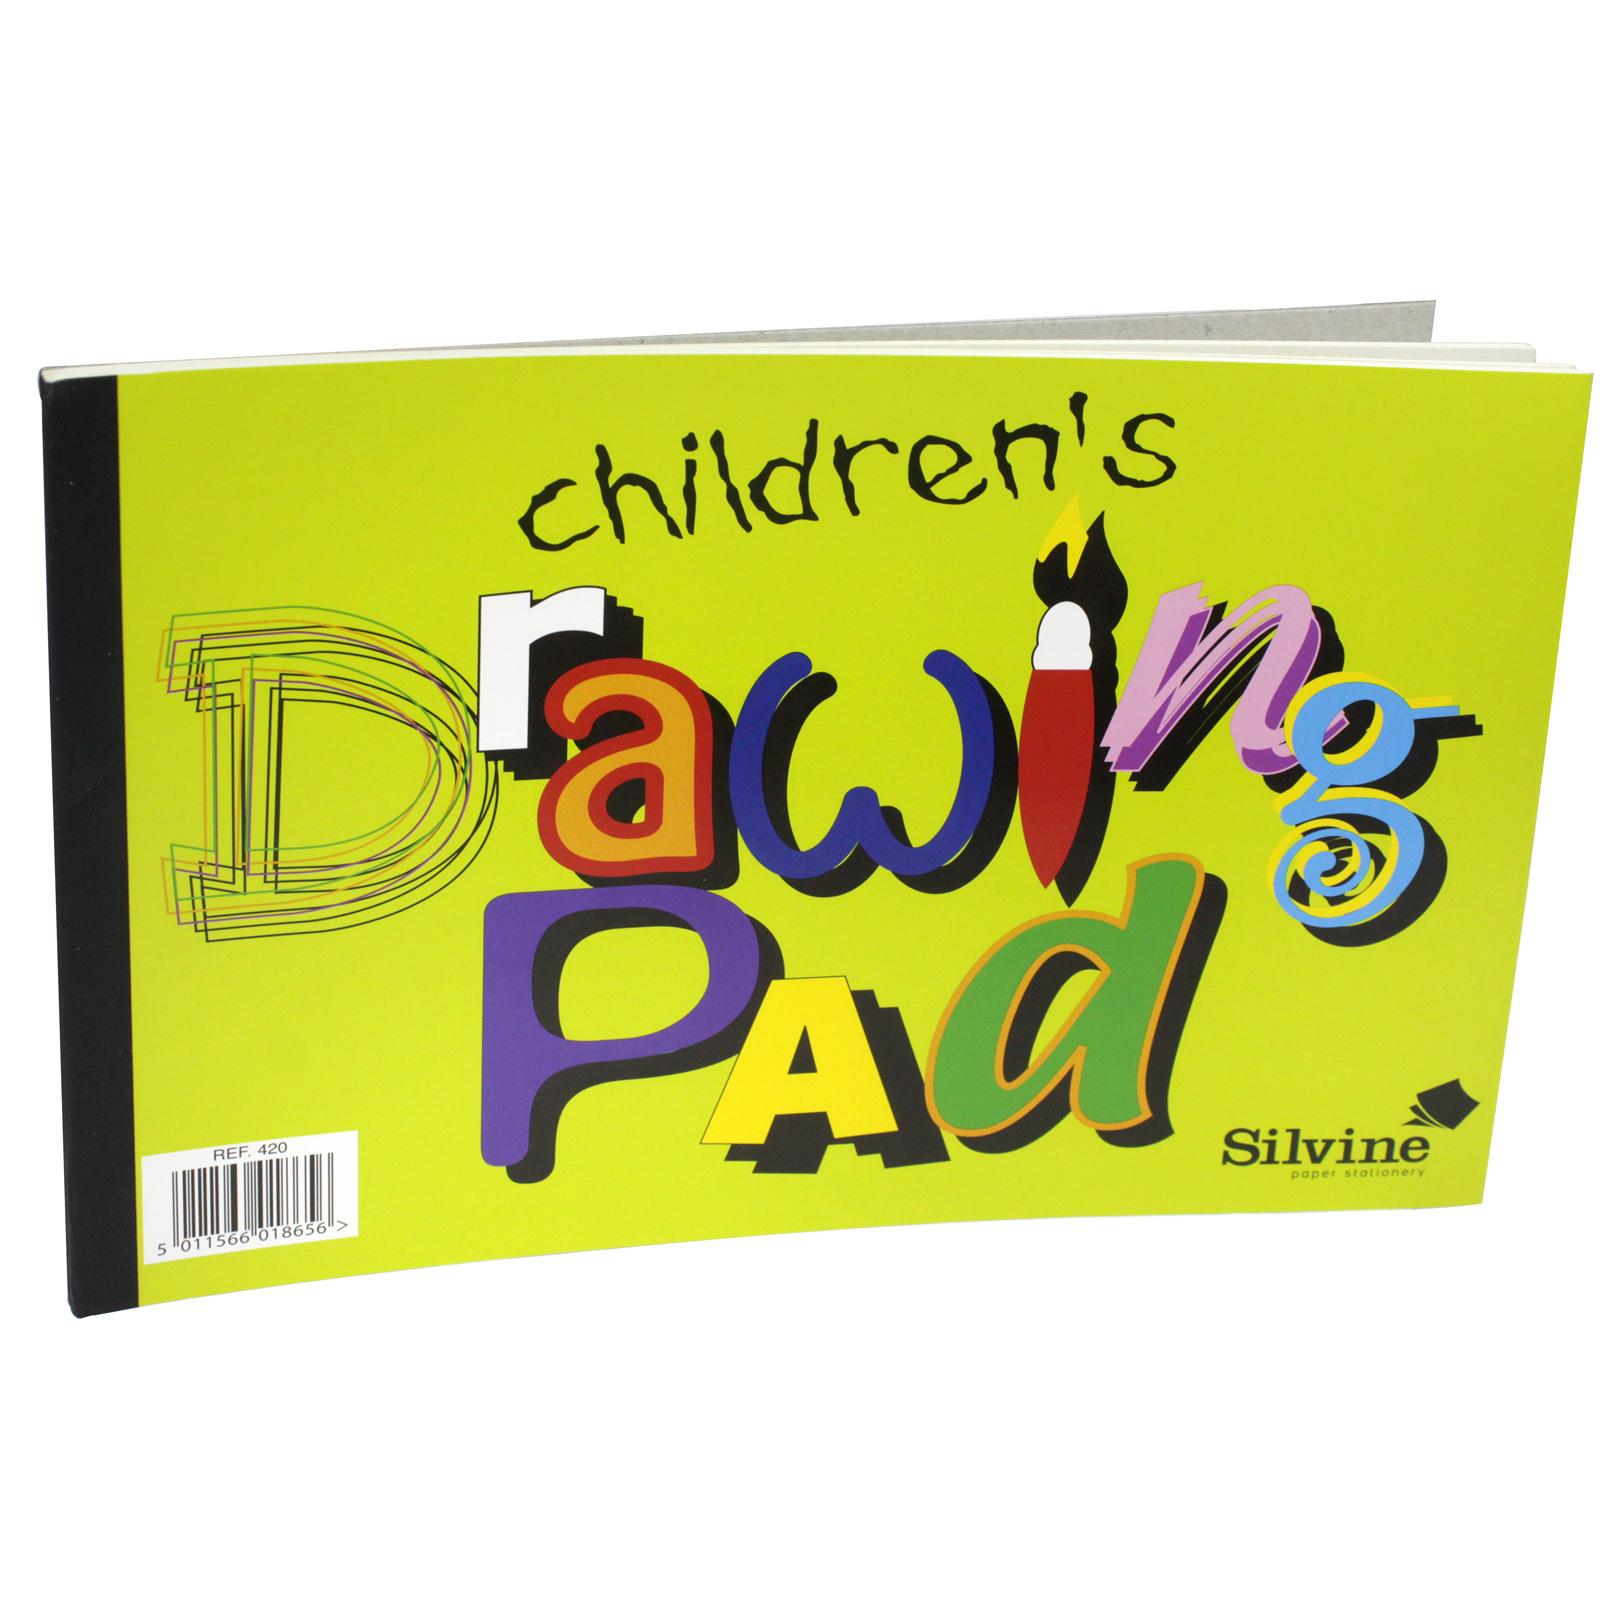 SILVINE KIDS DRAWING PAD RSP 79P